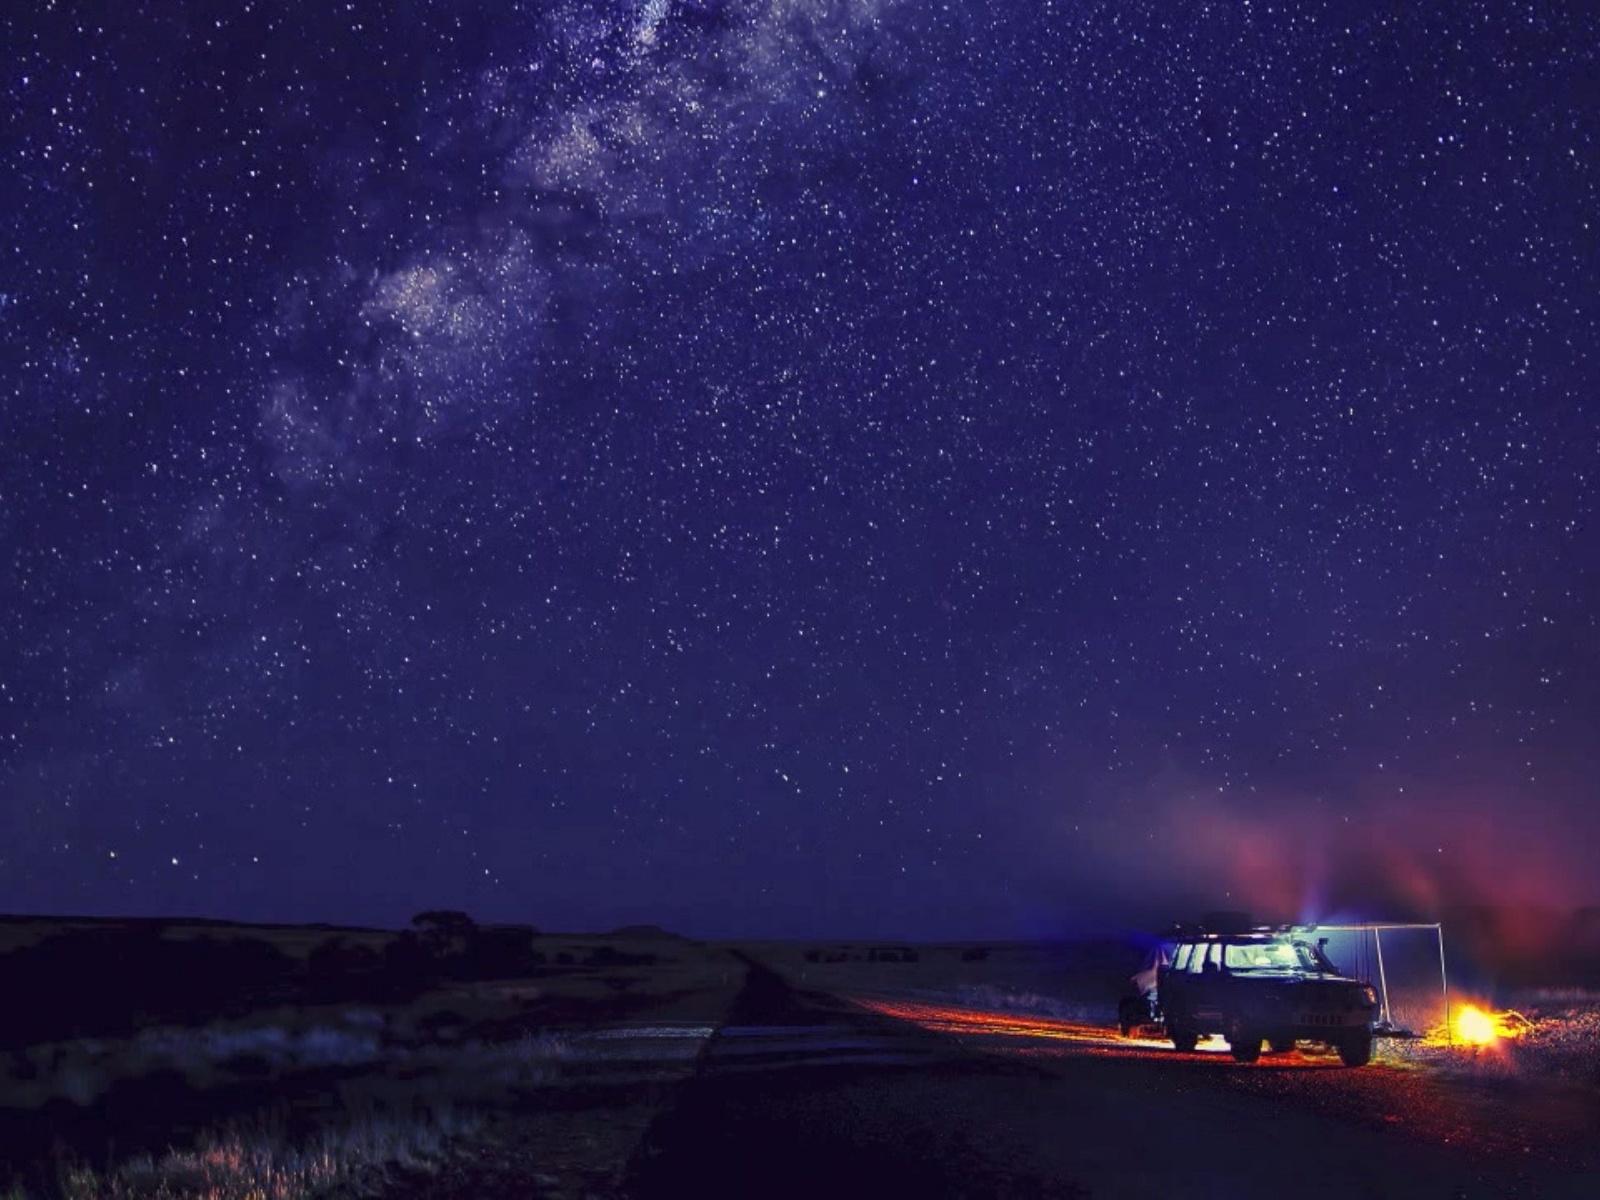 Starry Sky Wallpapers Widescreen 1600x1200 Wallpaper Teahub Io